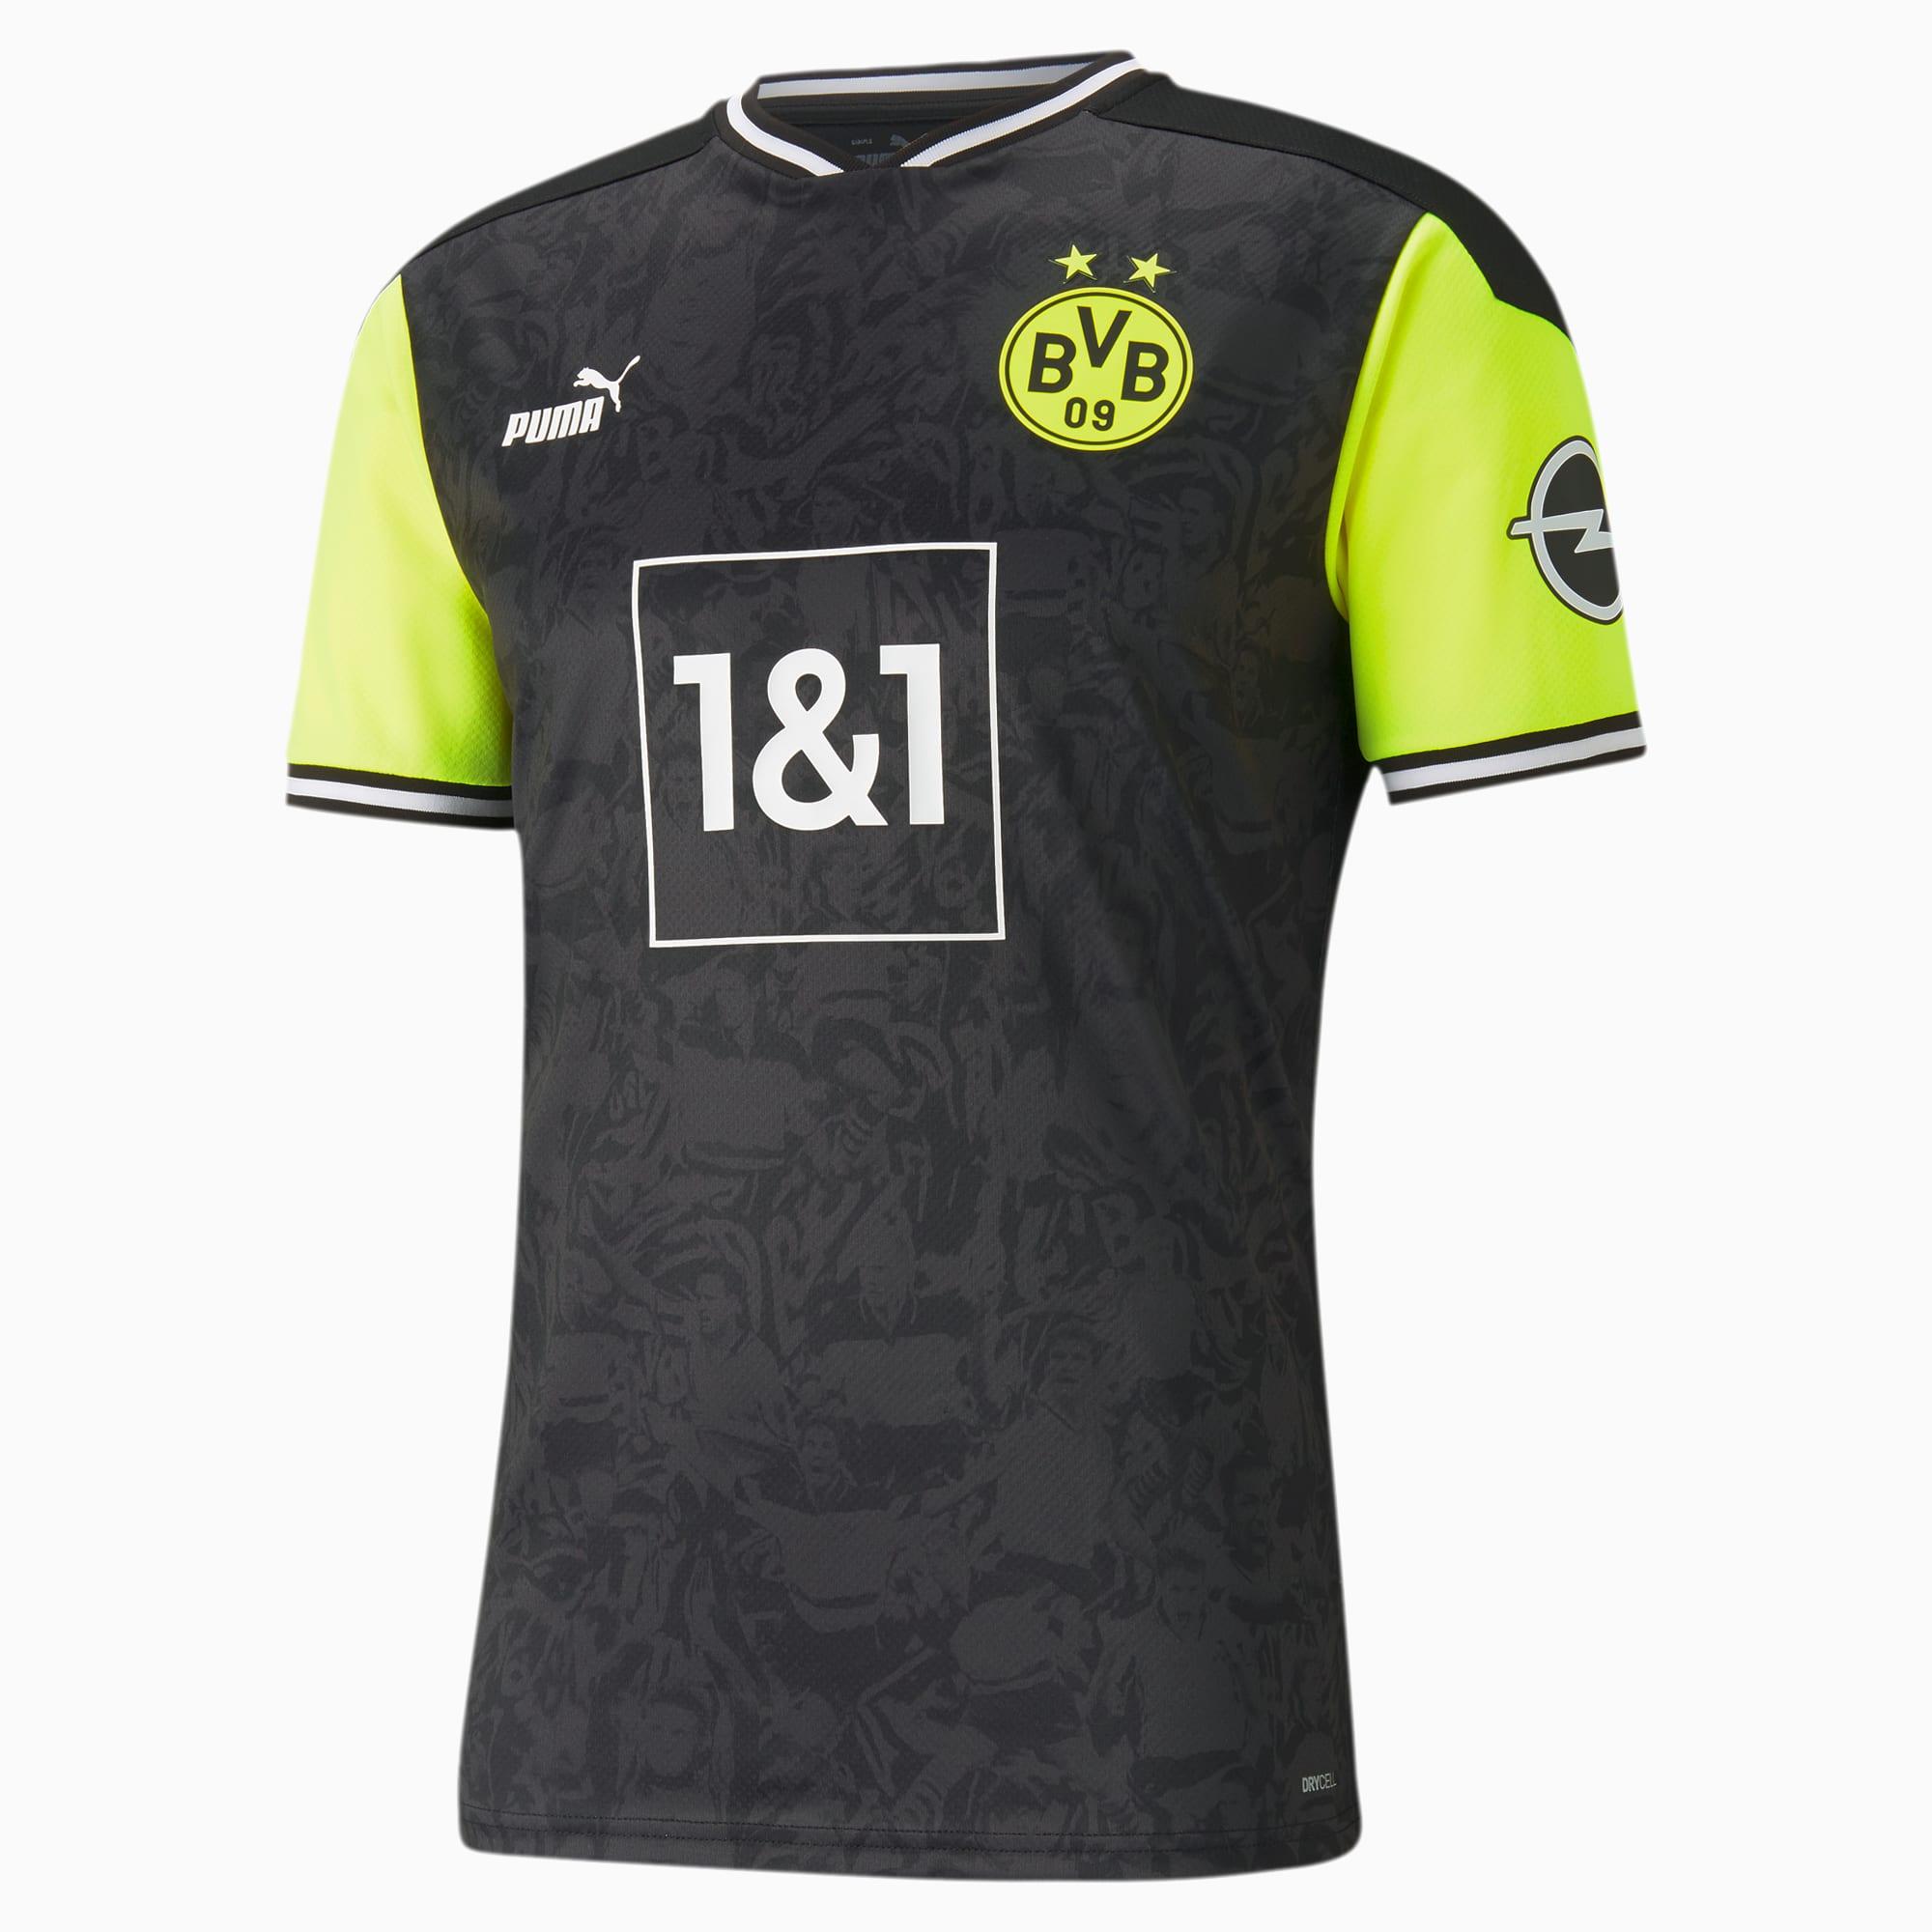 BVB Special Edition Men's Jersey | PUMA BVB | PUMA Luxembourg